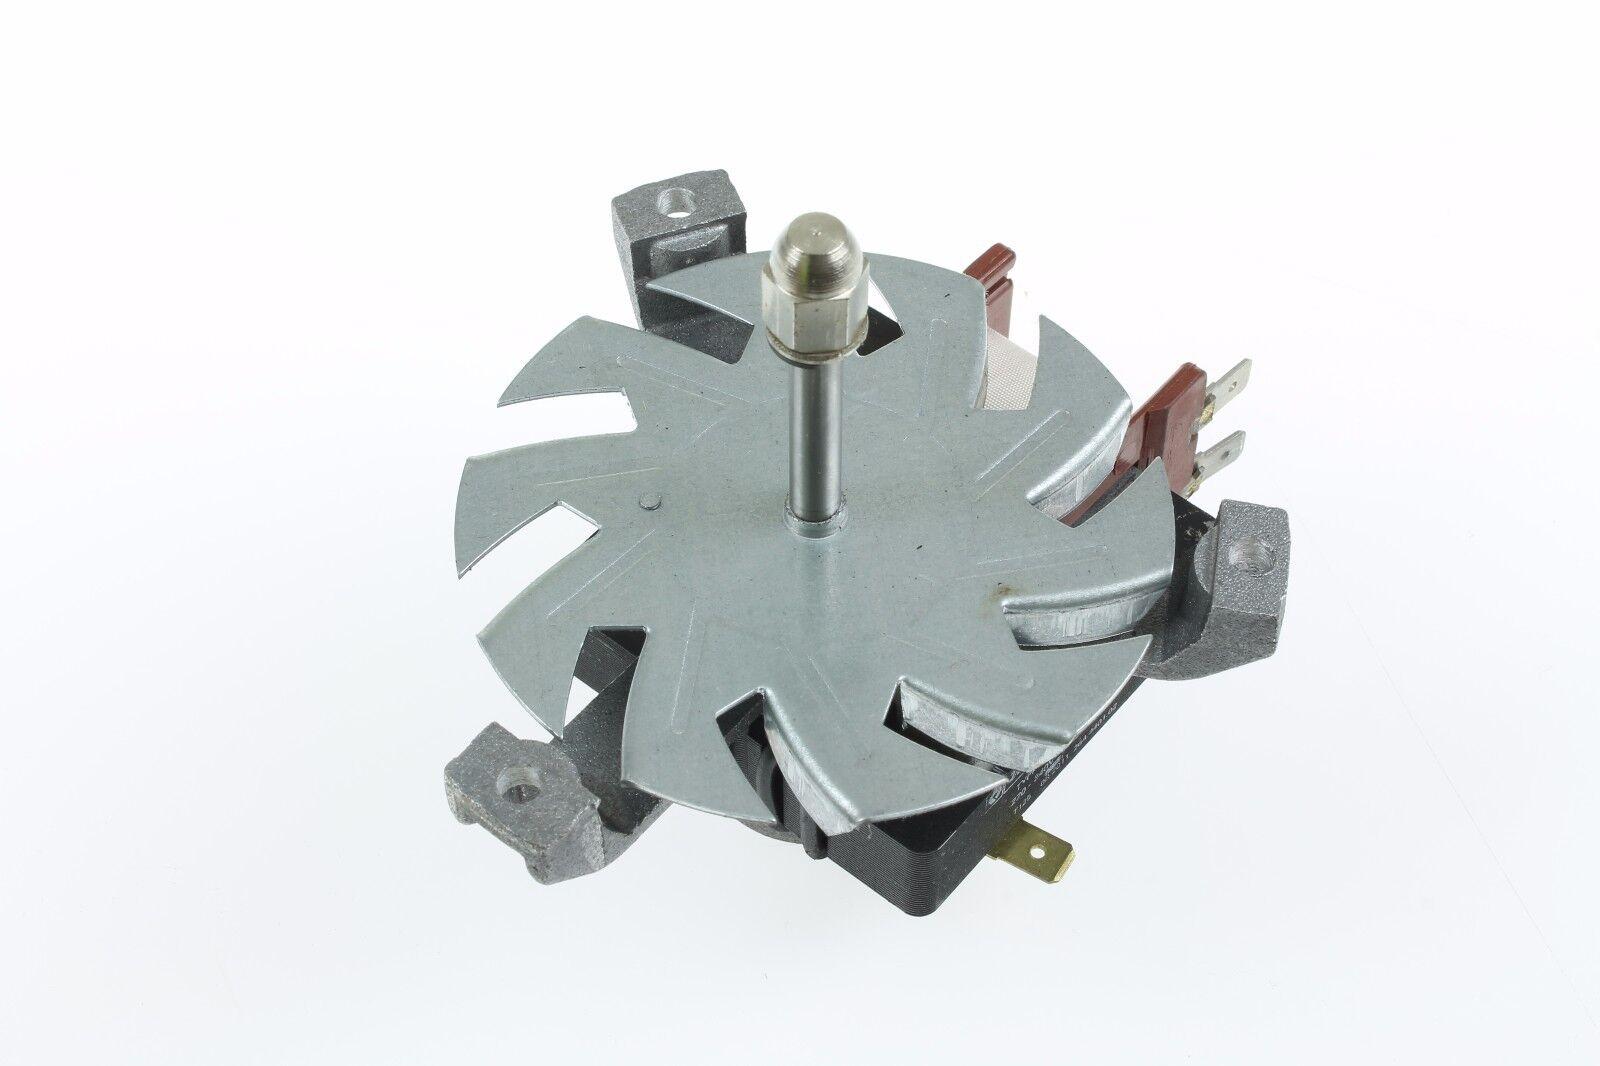 Genuine LEISURE LEVI68X GRB6CVK GRB6FVK LEVC67X Fan Oven Cooker Motor Unit